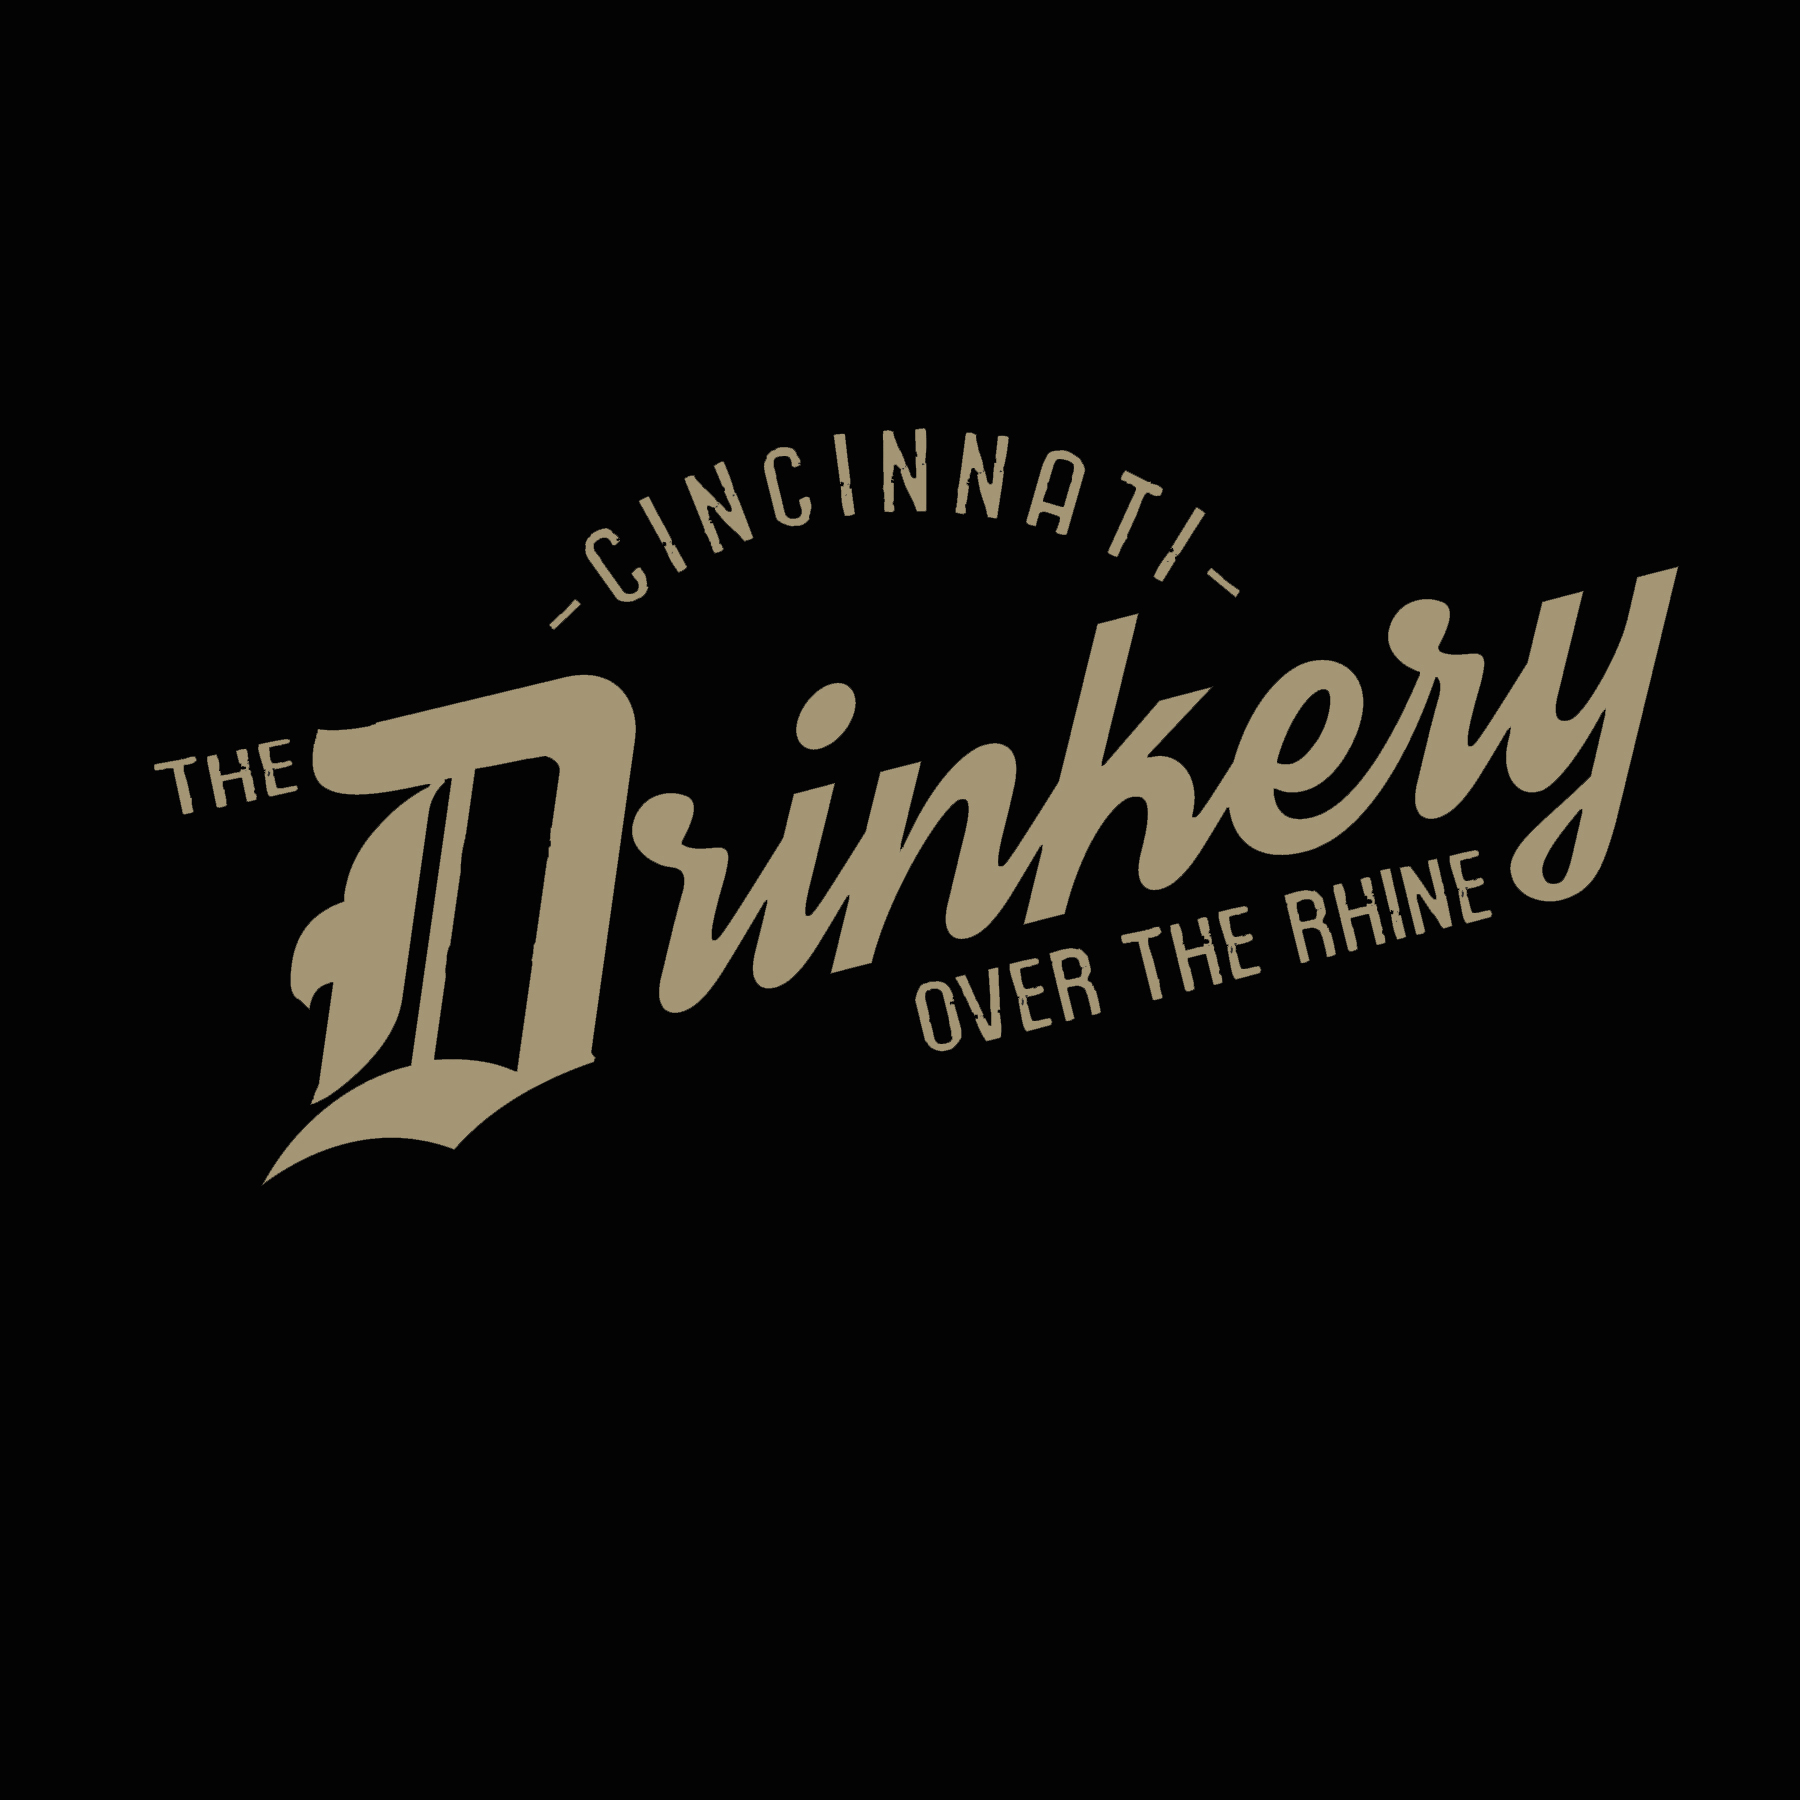 drinknewBLACK